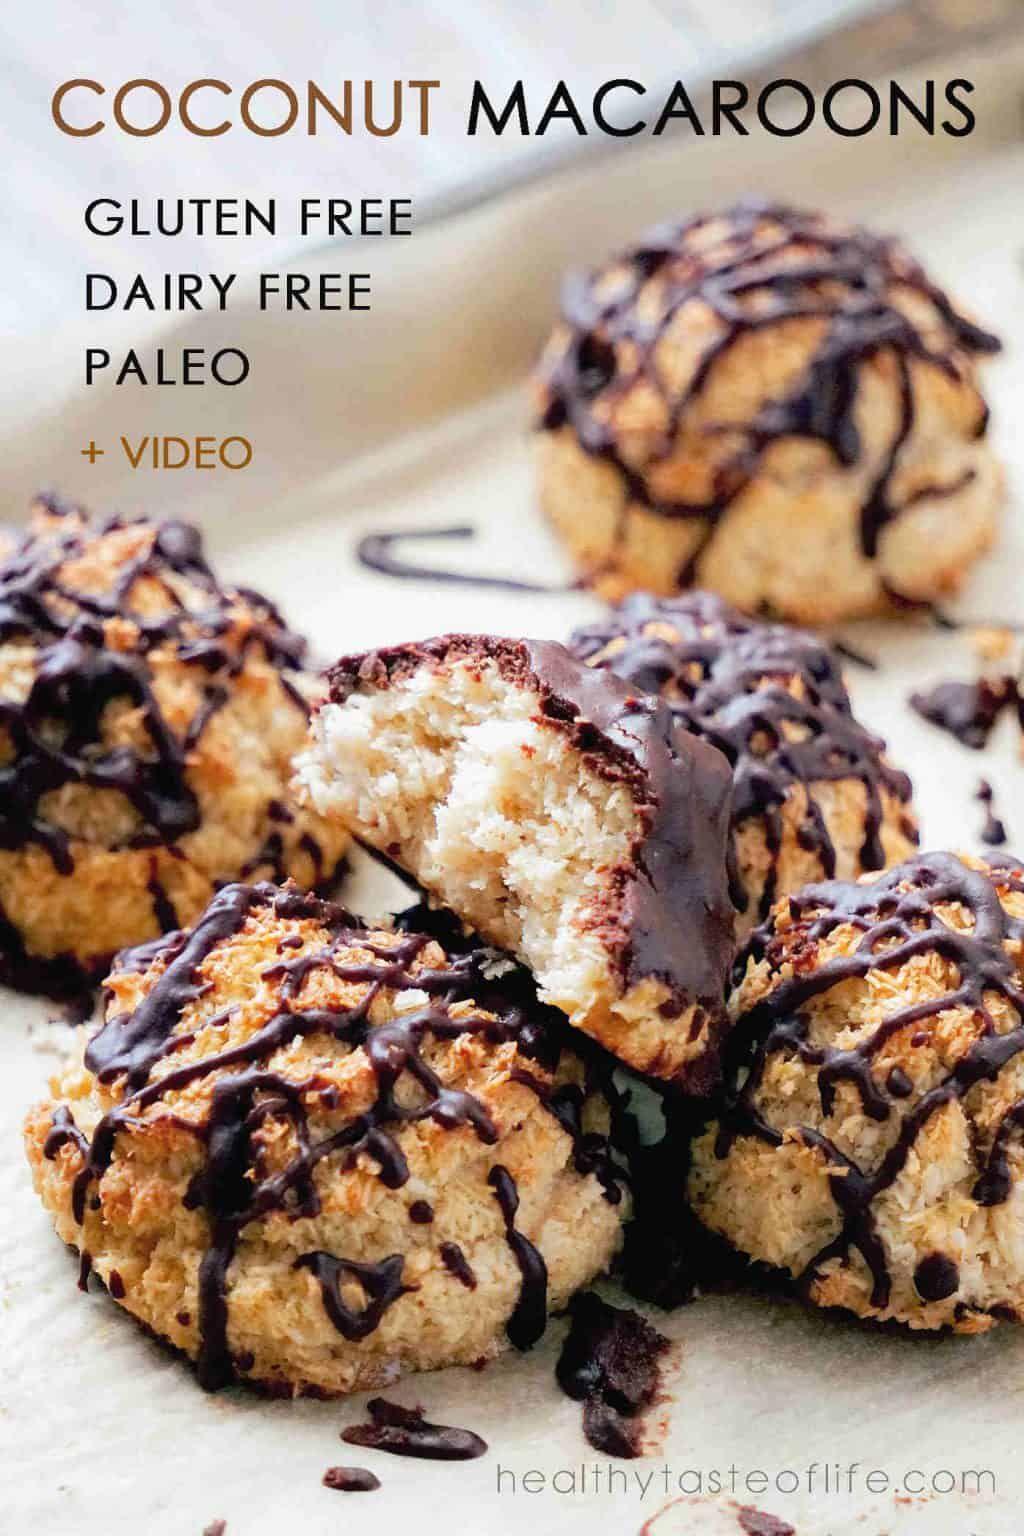 Gluten free coconut macaroons dairy free paleo recipe